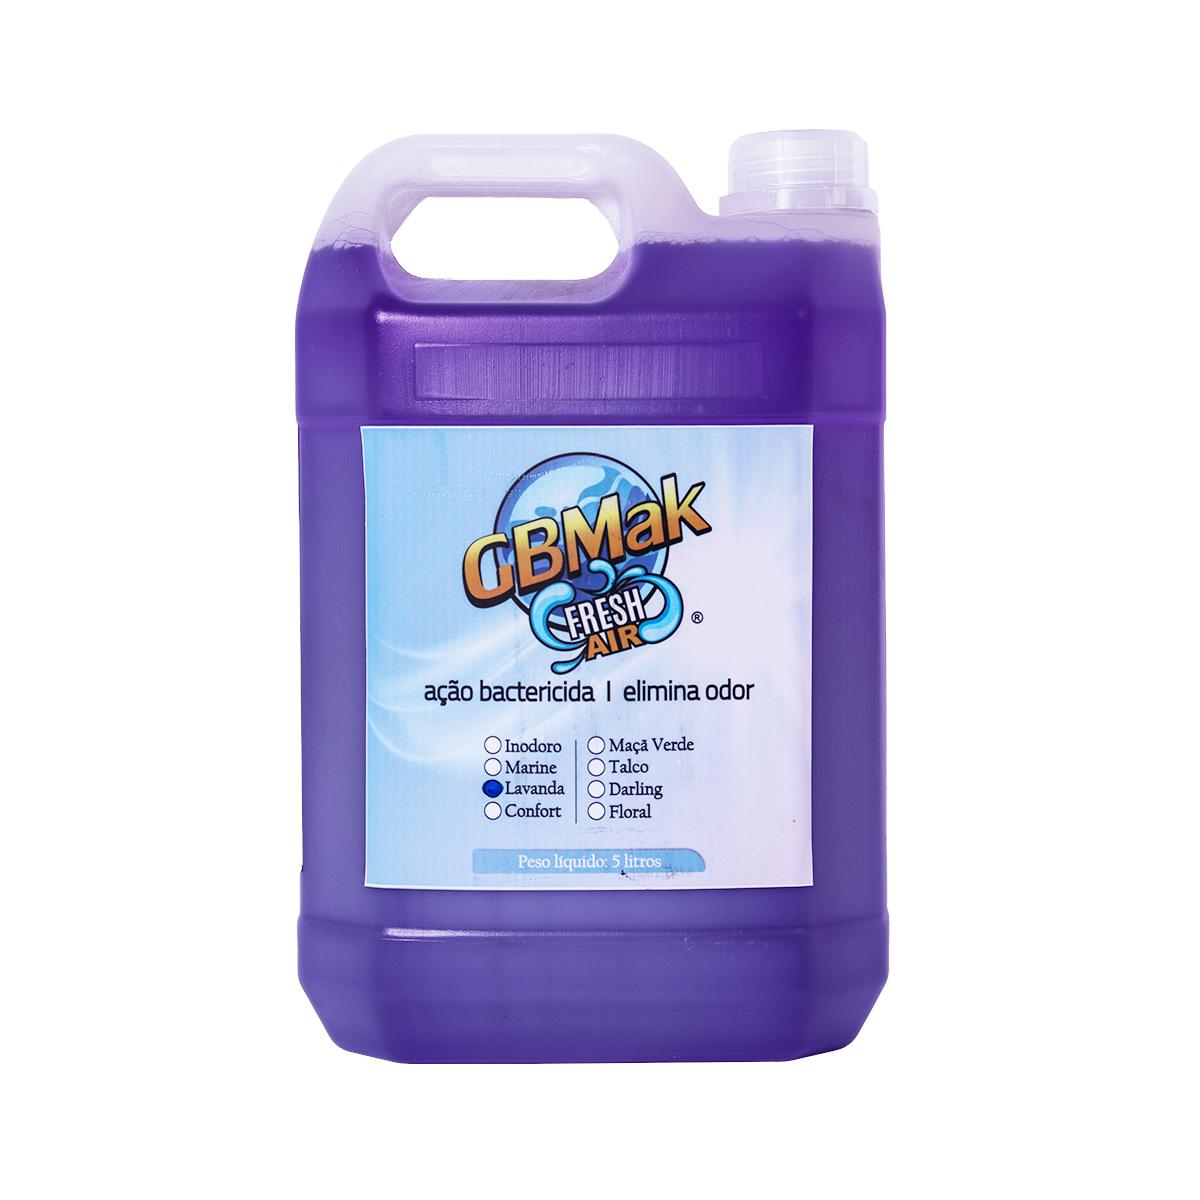 Kit De Limpeza 1 Pulverizador 1,5 Litros + 1 Bactericida 5 Litros